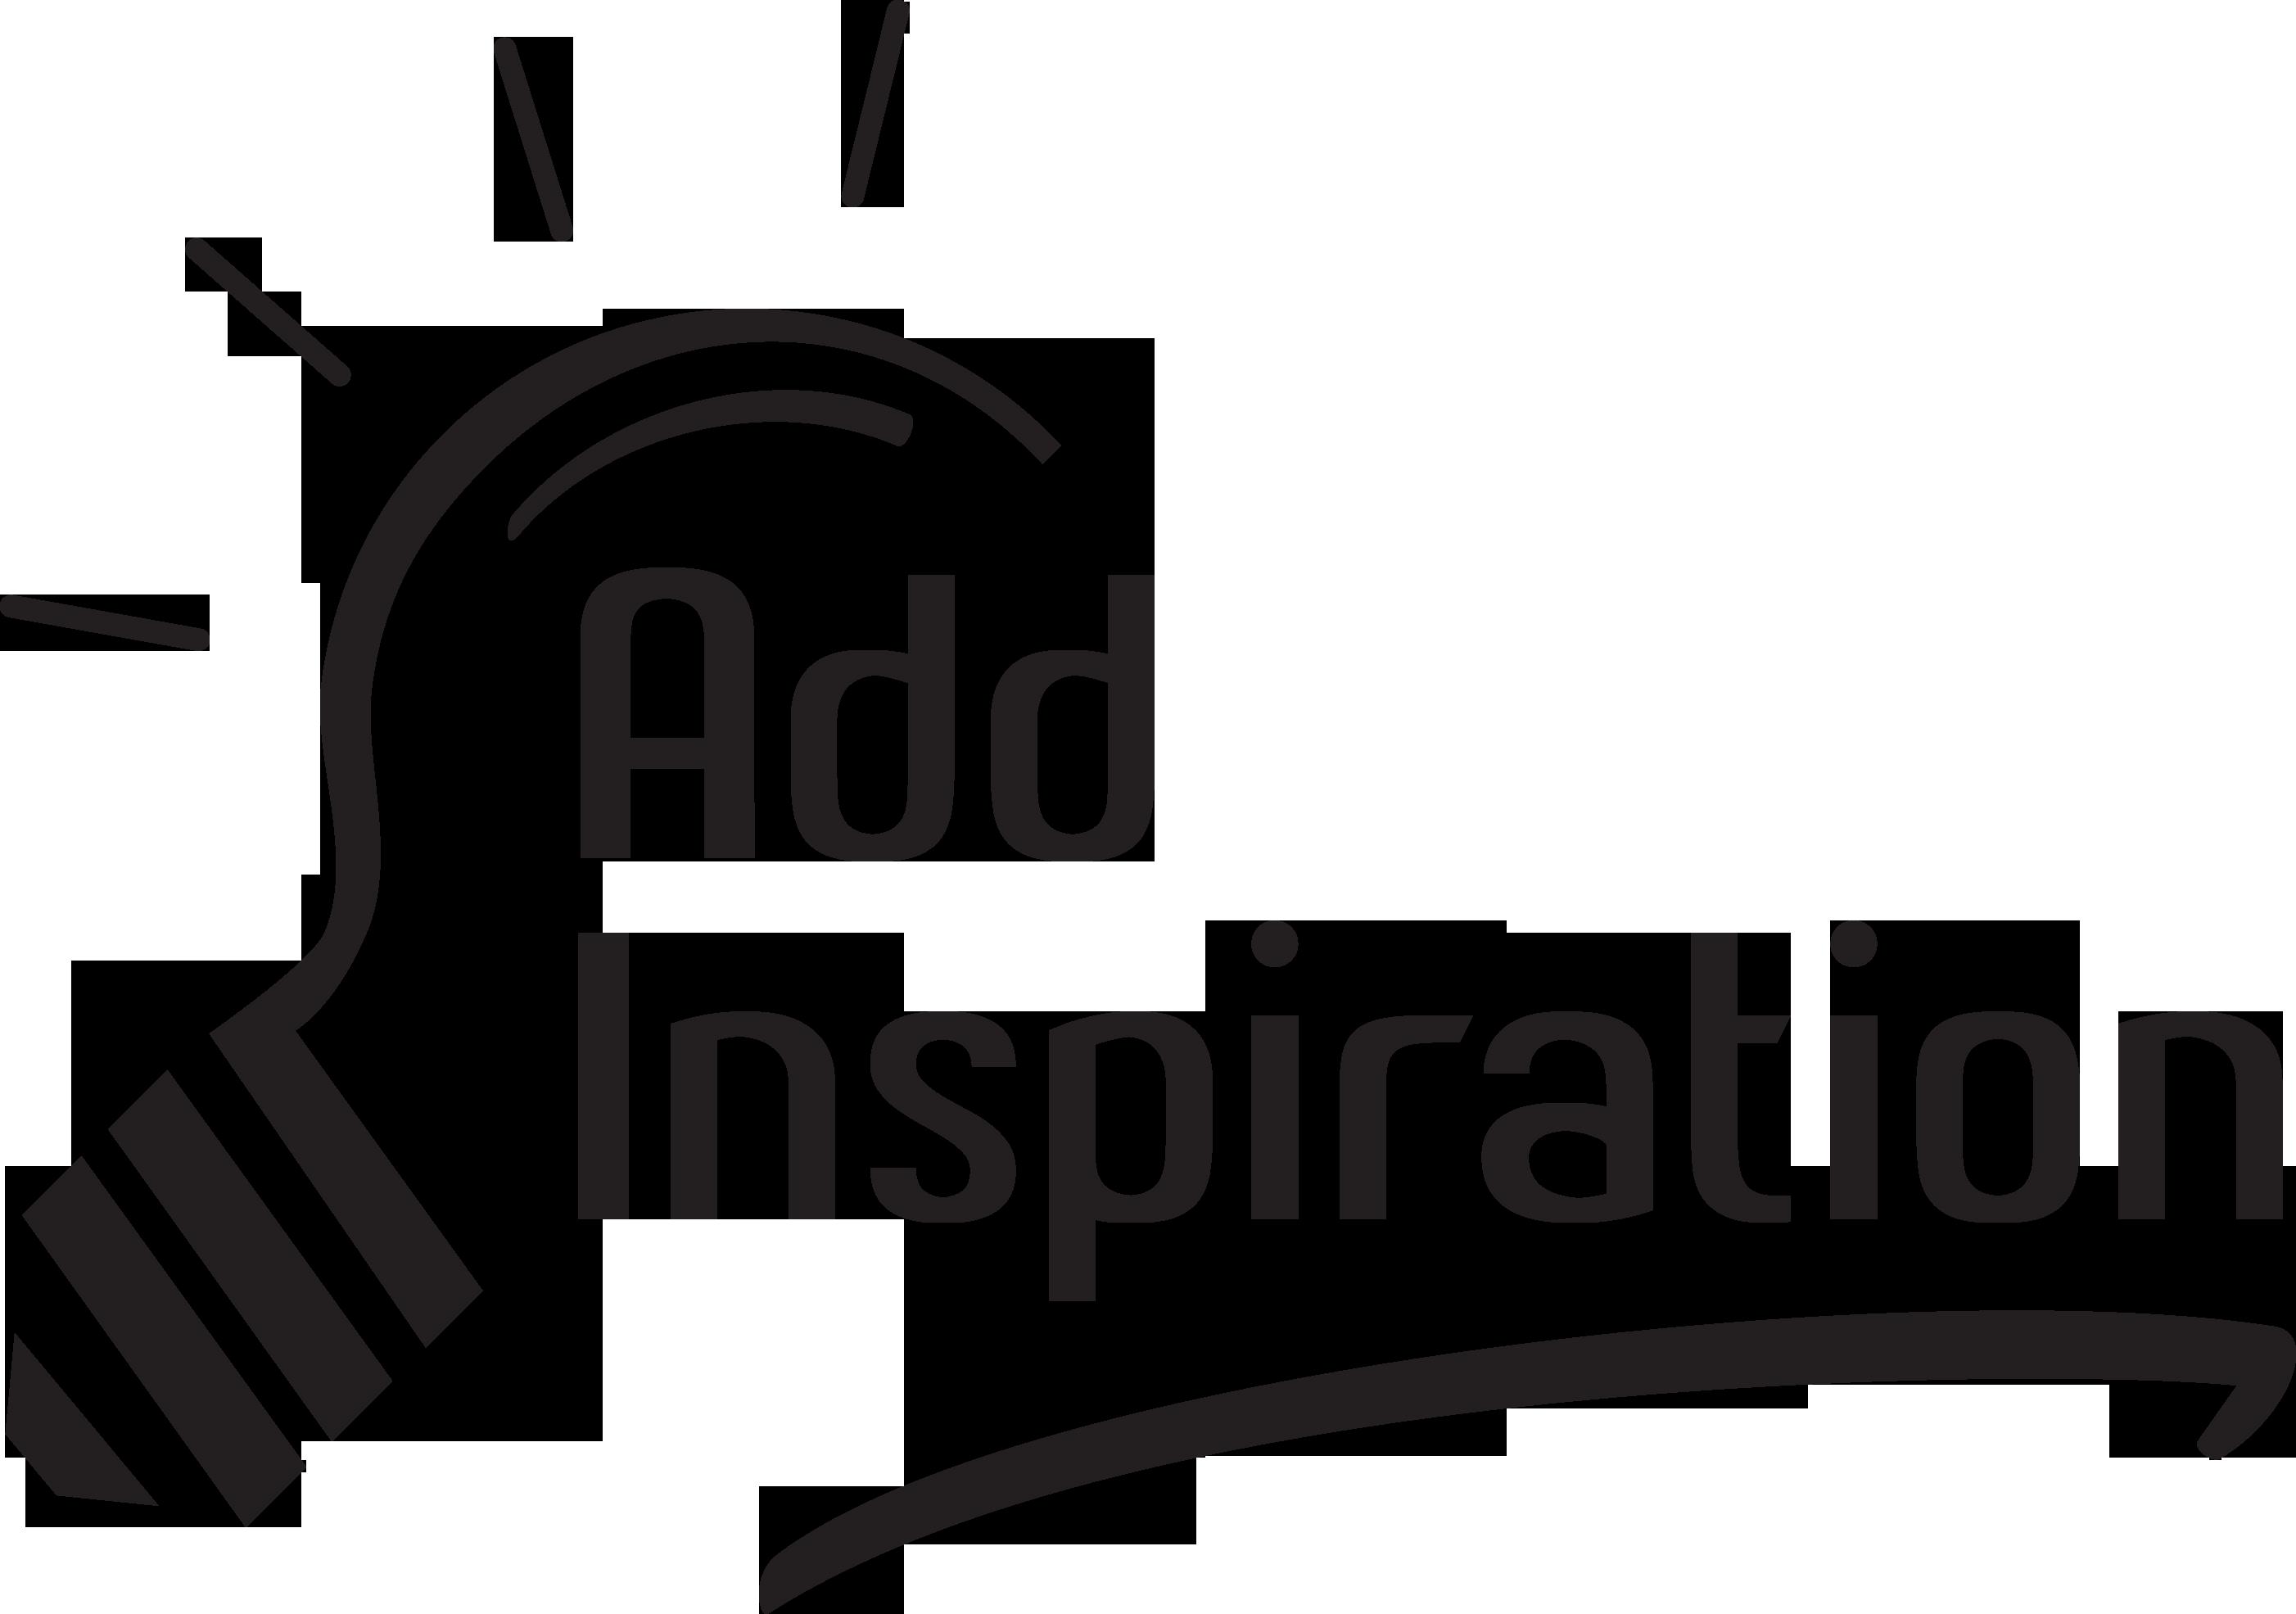 Add Inspiration